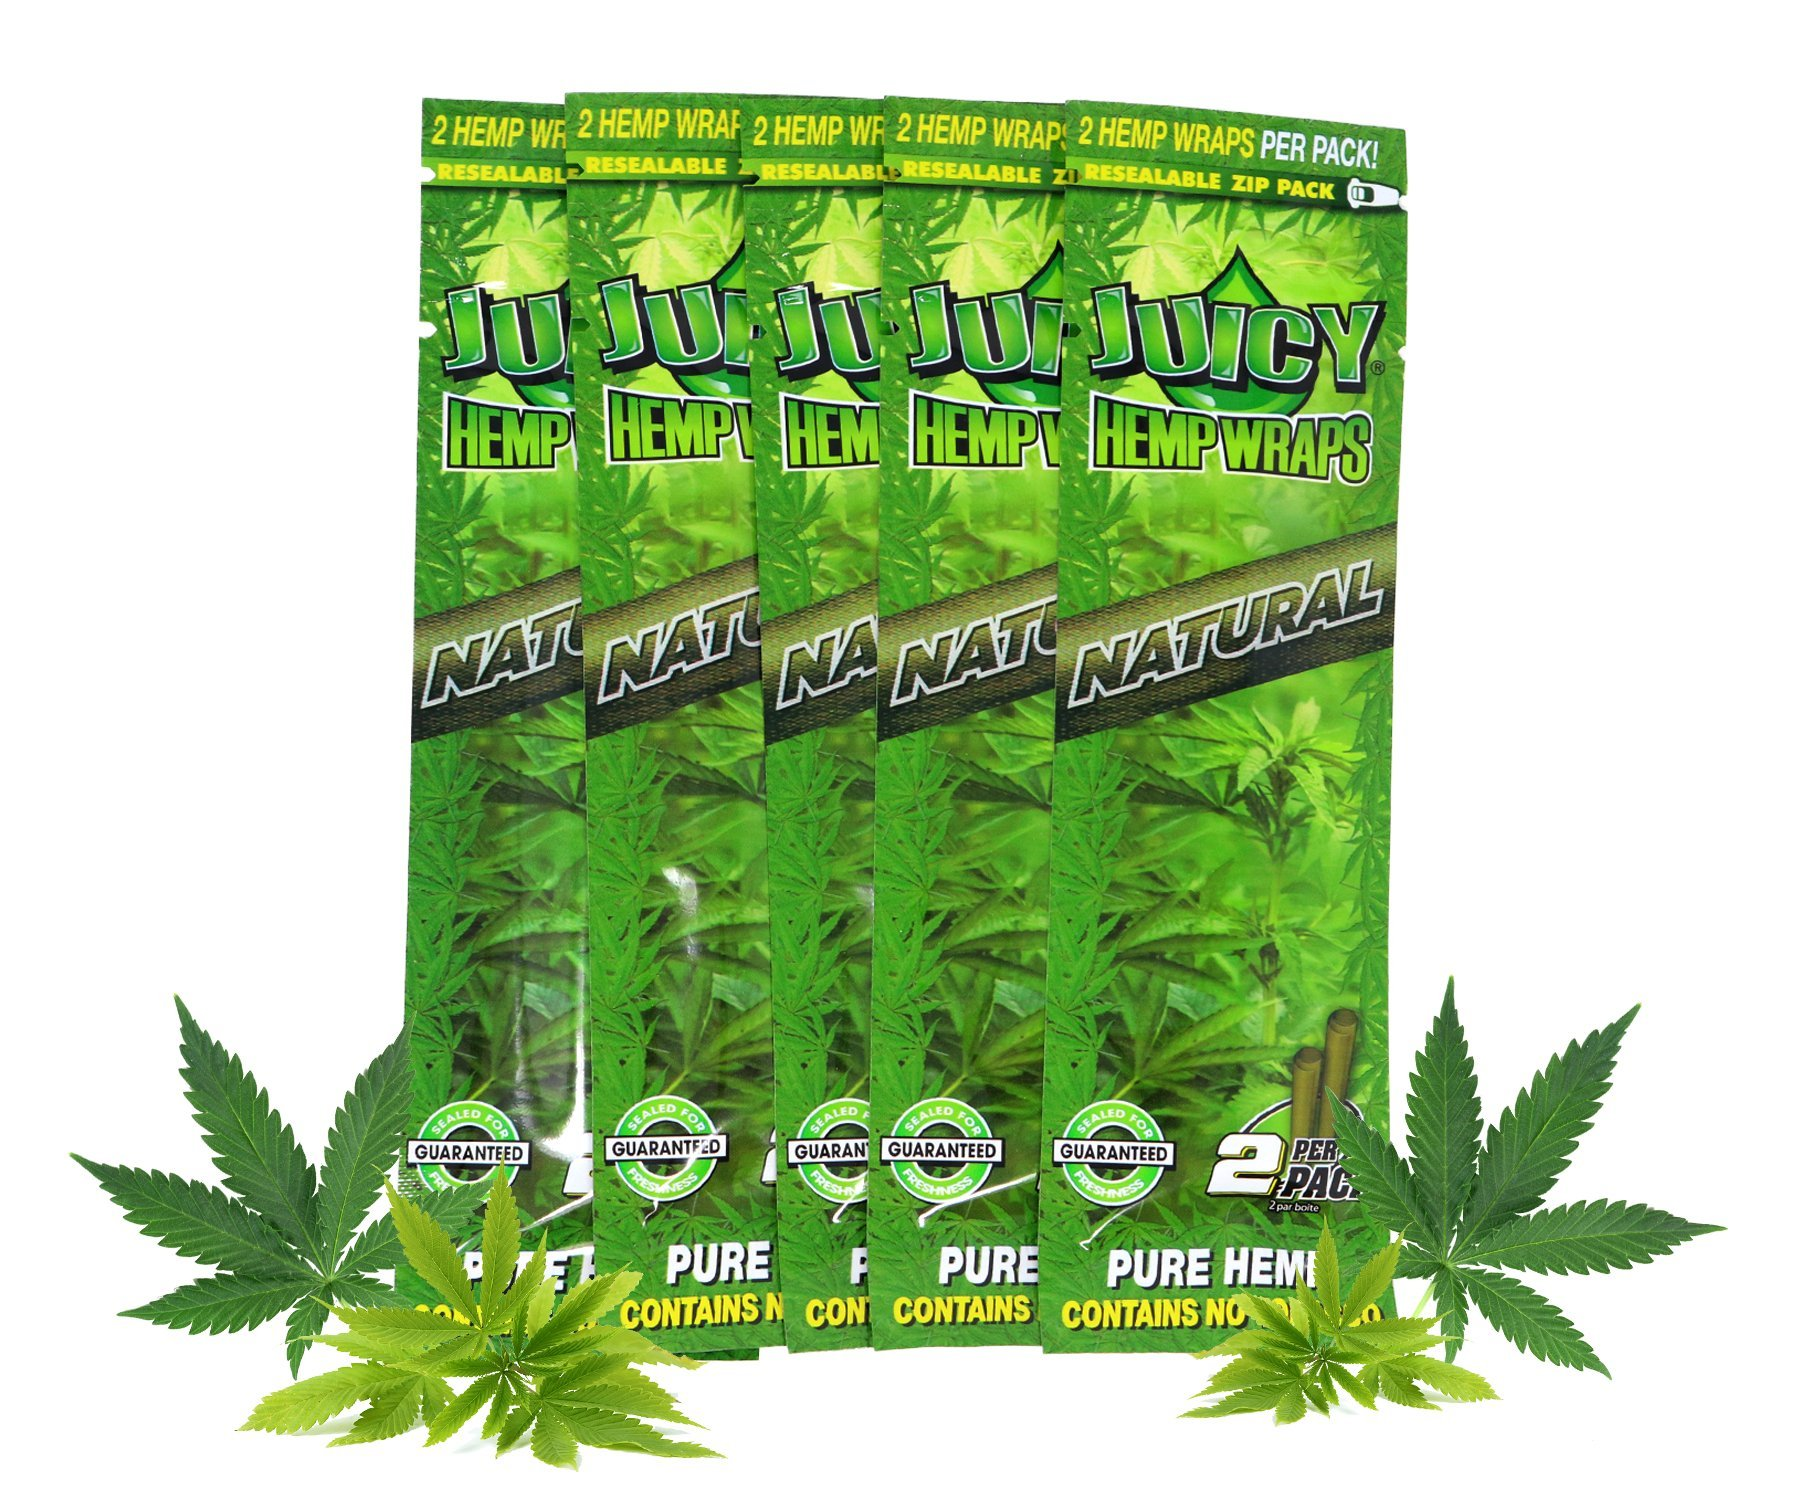 Juicy Jay Hemp Wraps Natural (10 Packs, 2 Wraps Per Pack) Total 20 Wraps with ES Scoop Card